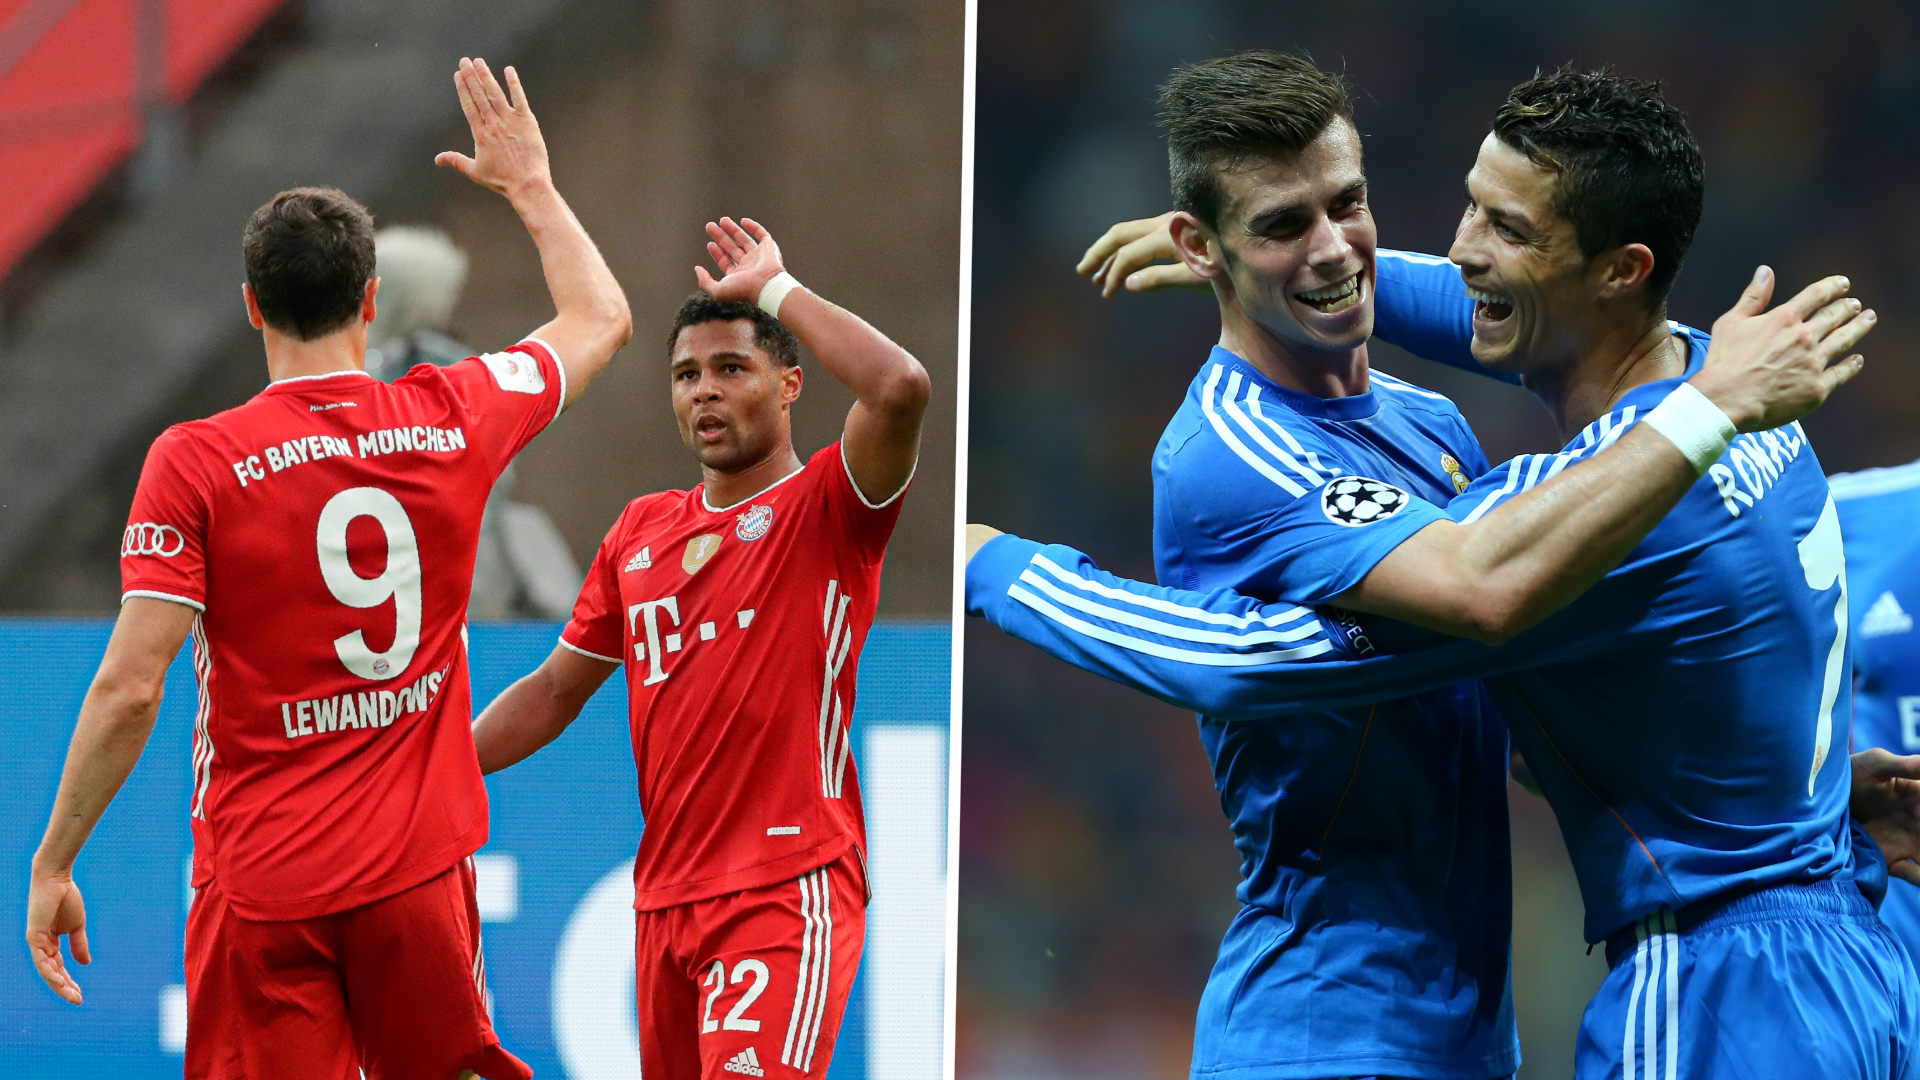 Gnabry and Lewandowski surpass Ronaldo and Bale as Bayern near Champions League goal-scoring record